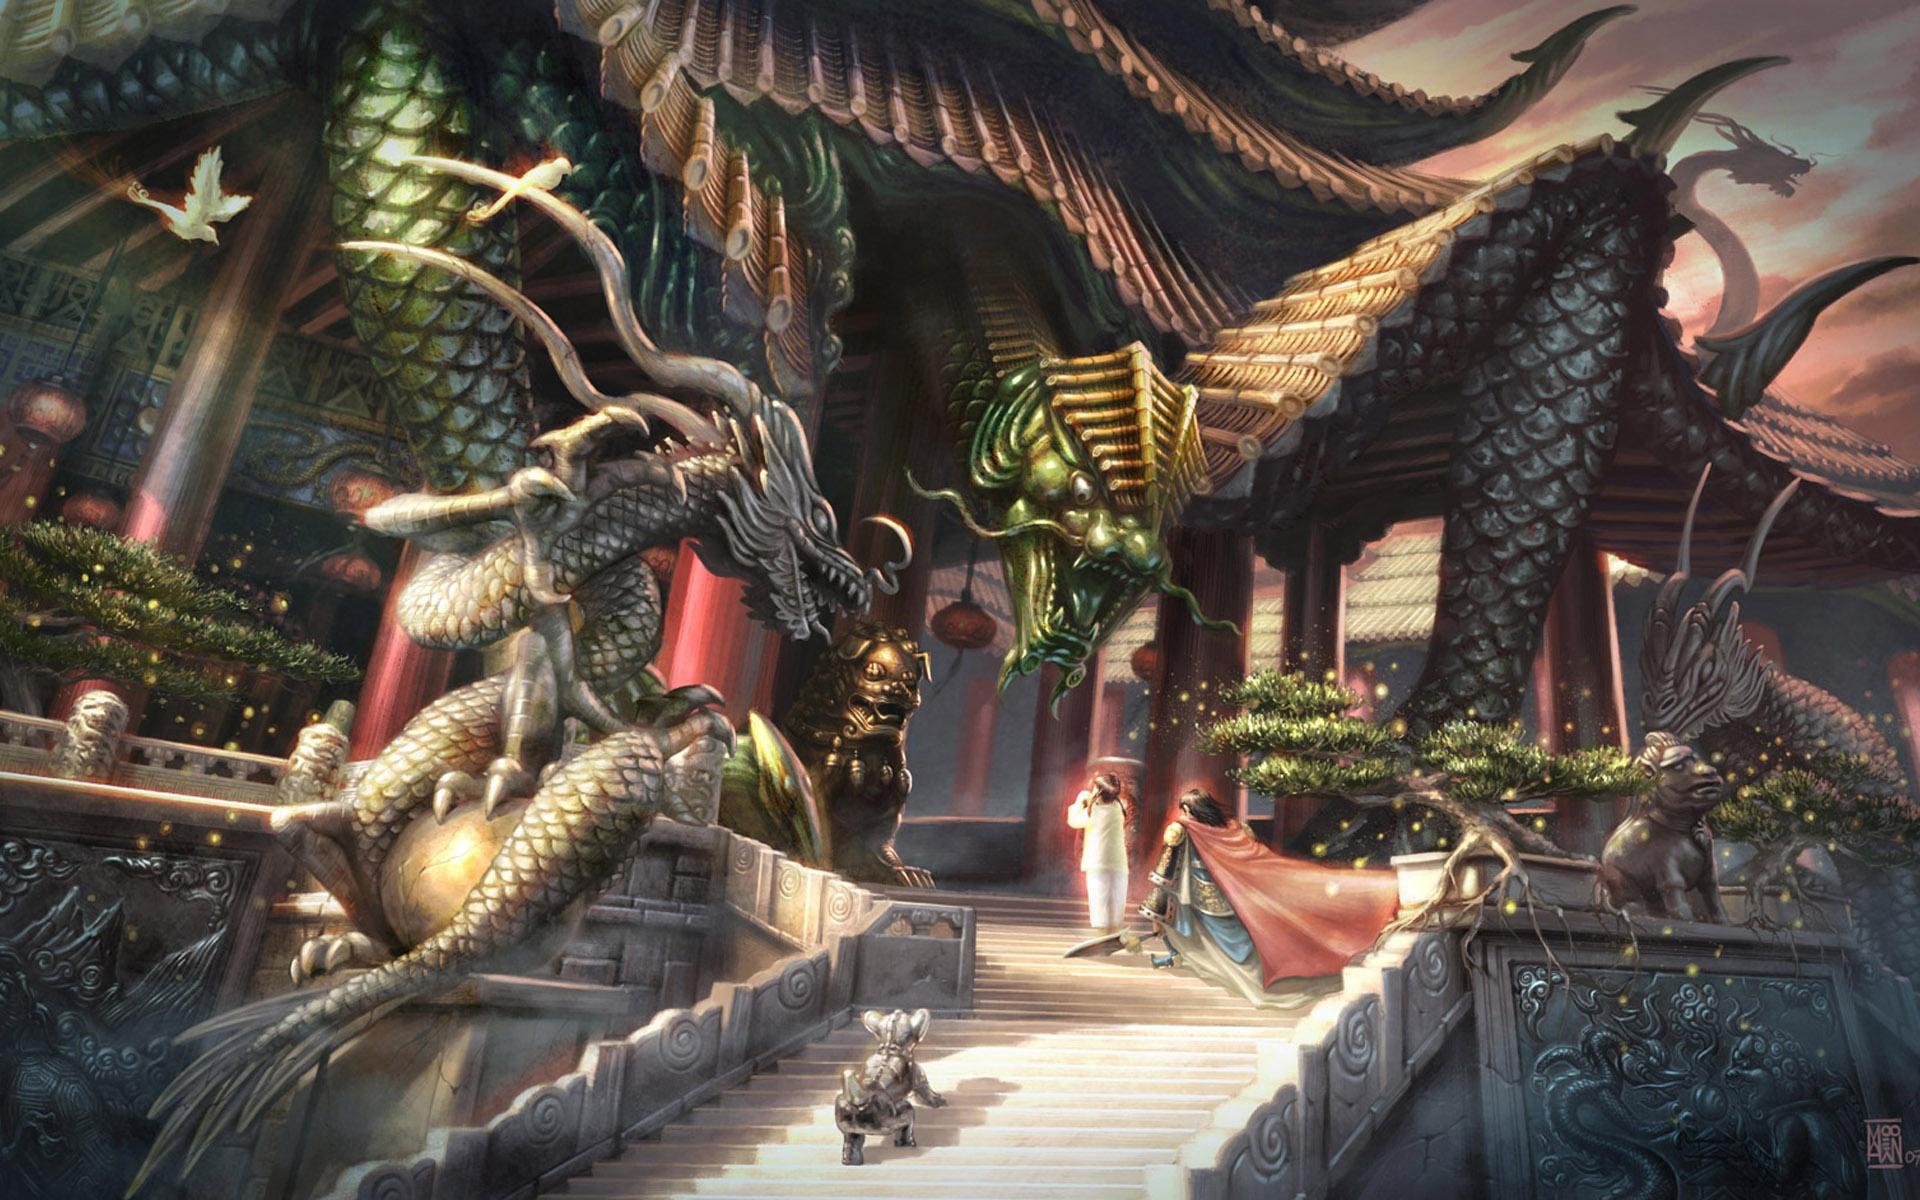 Fantasy Resolution Dragon Photo Wallpapers Desktop 1920x1200